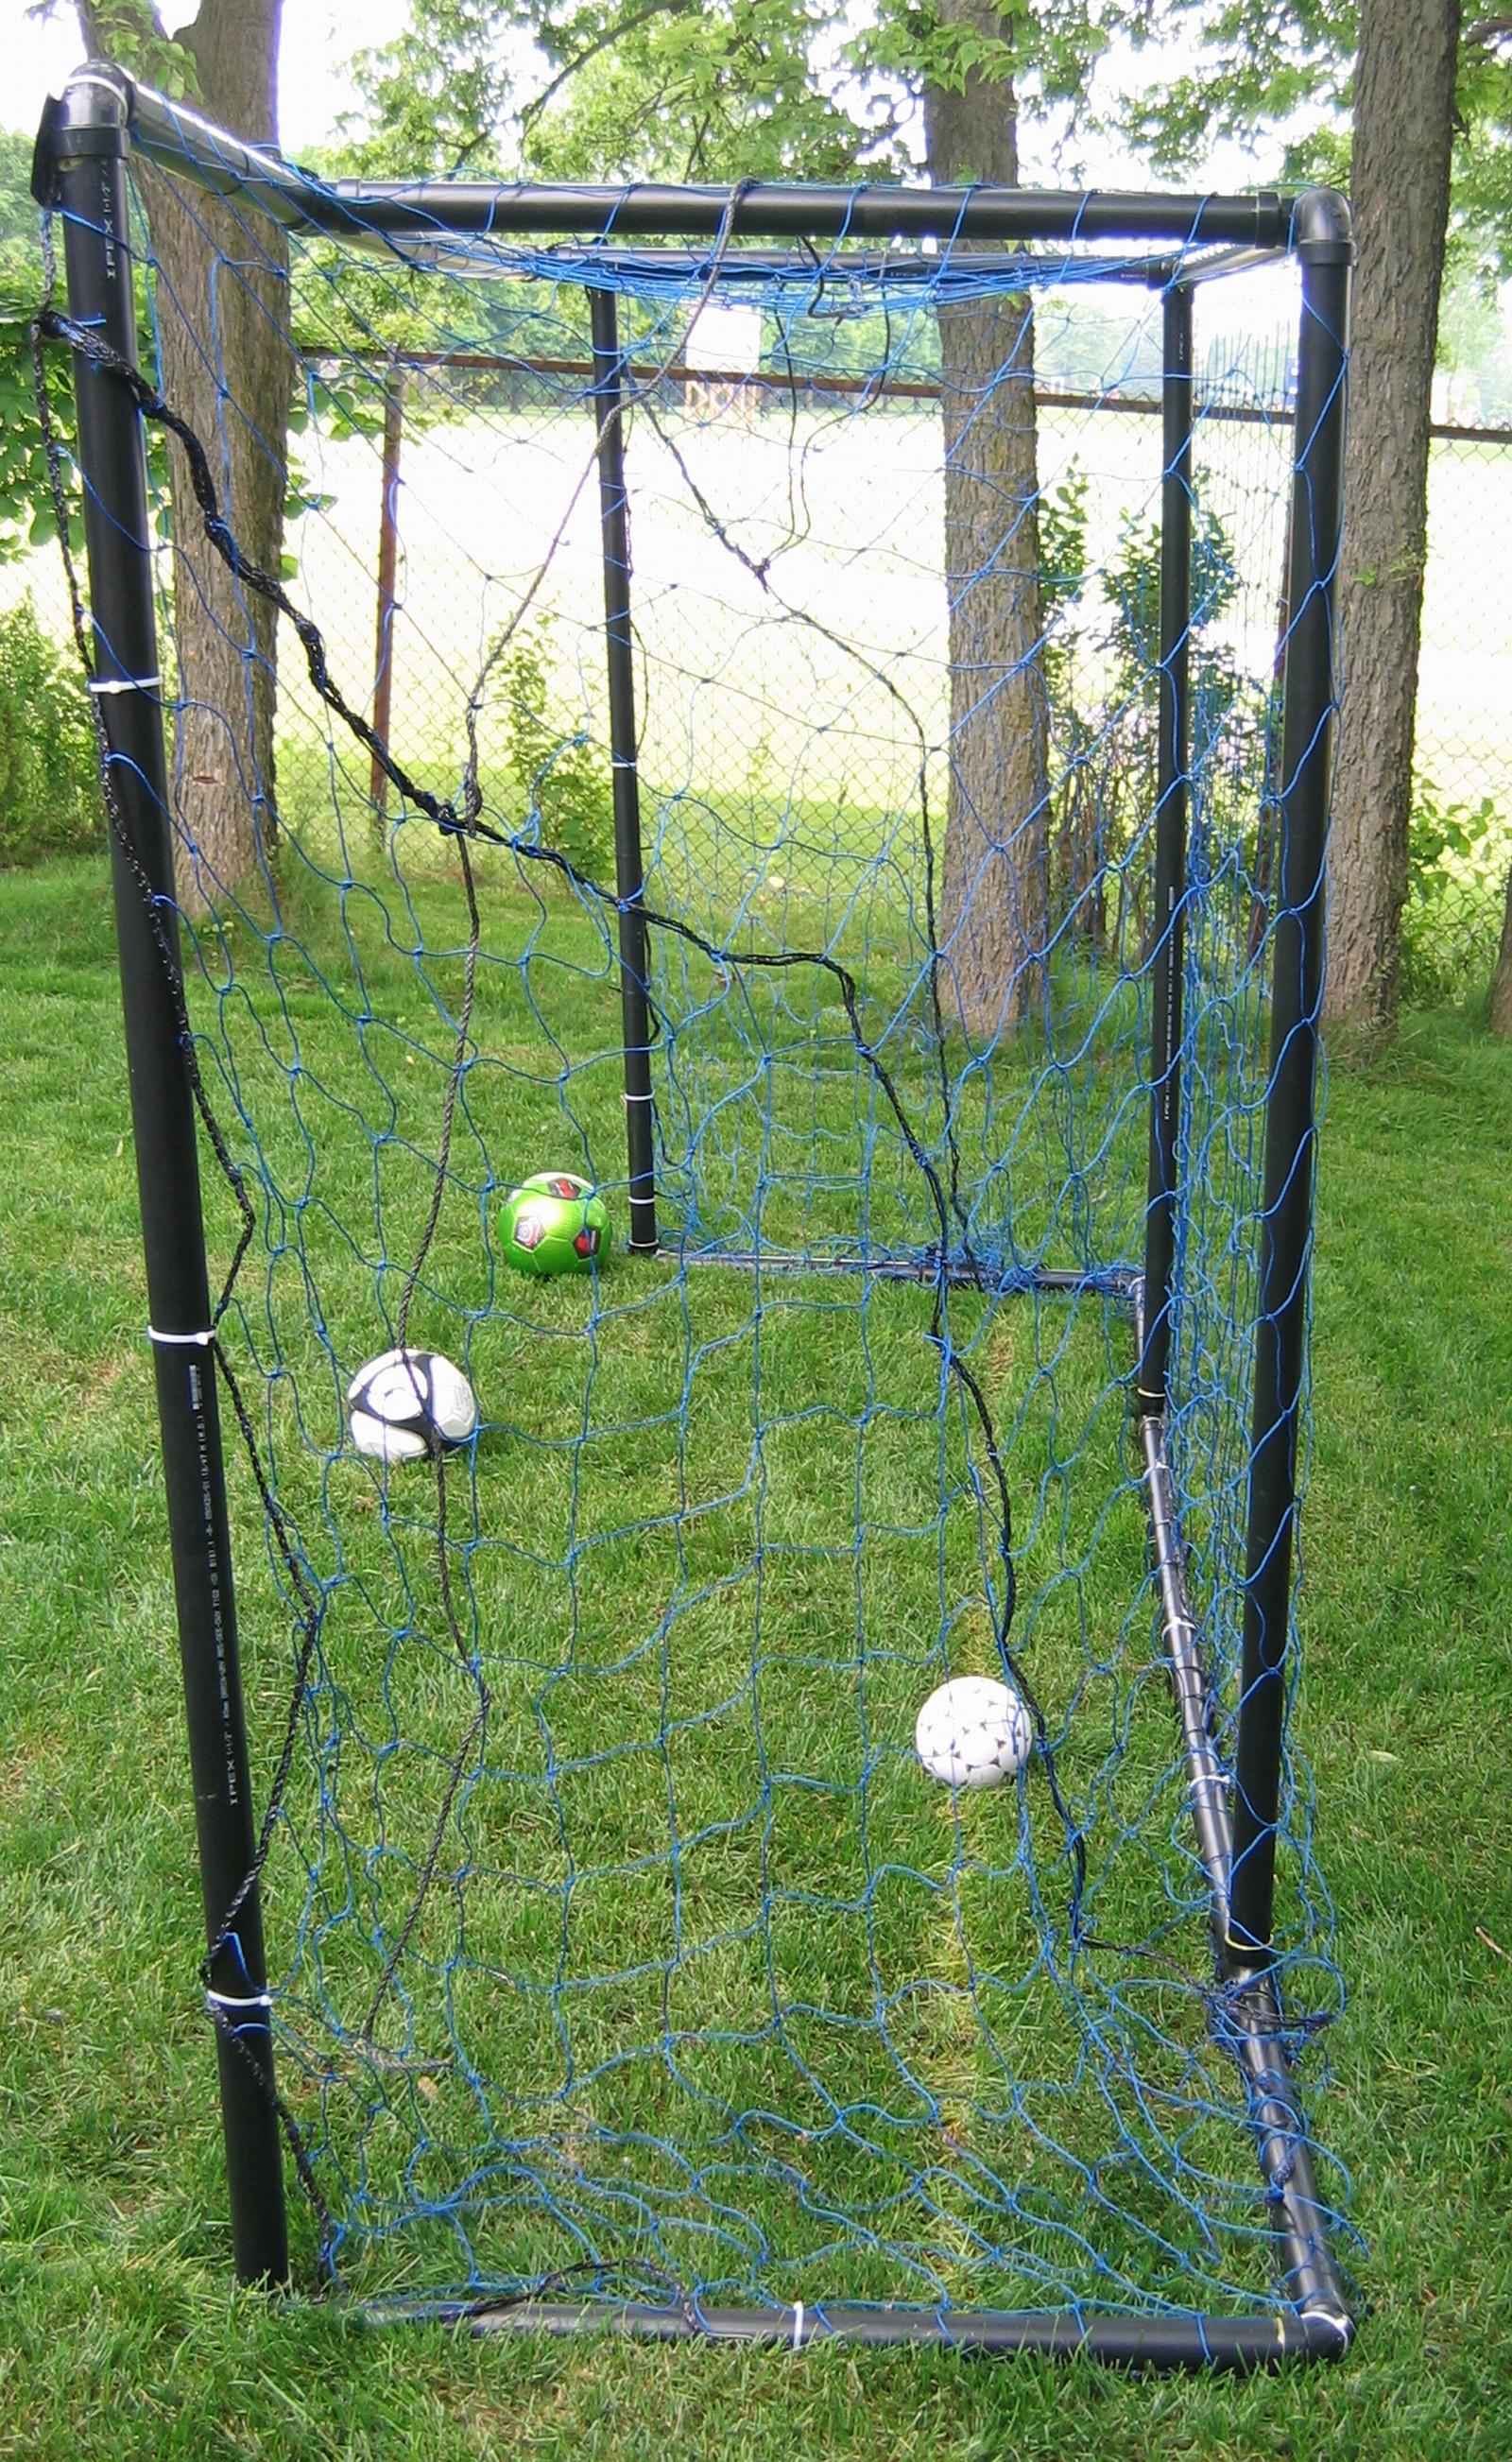 moc make your own soccer goal